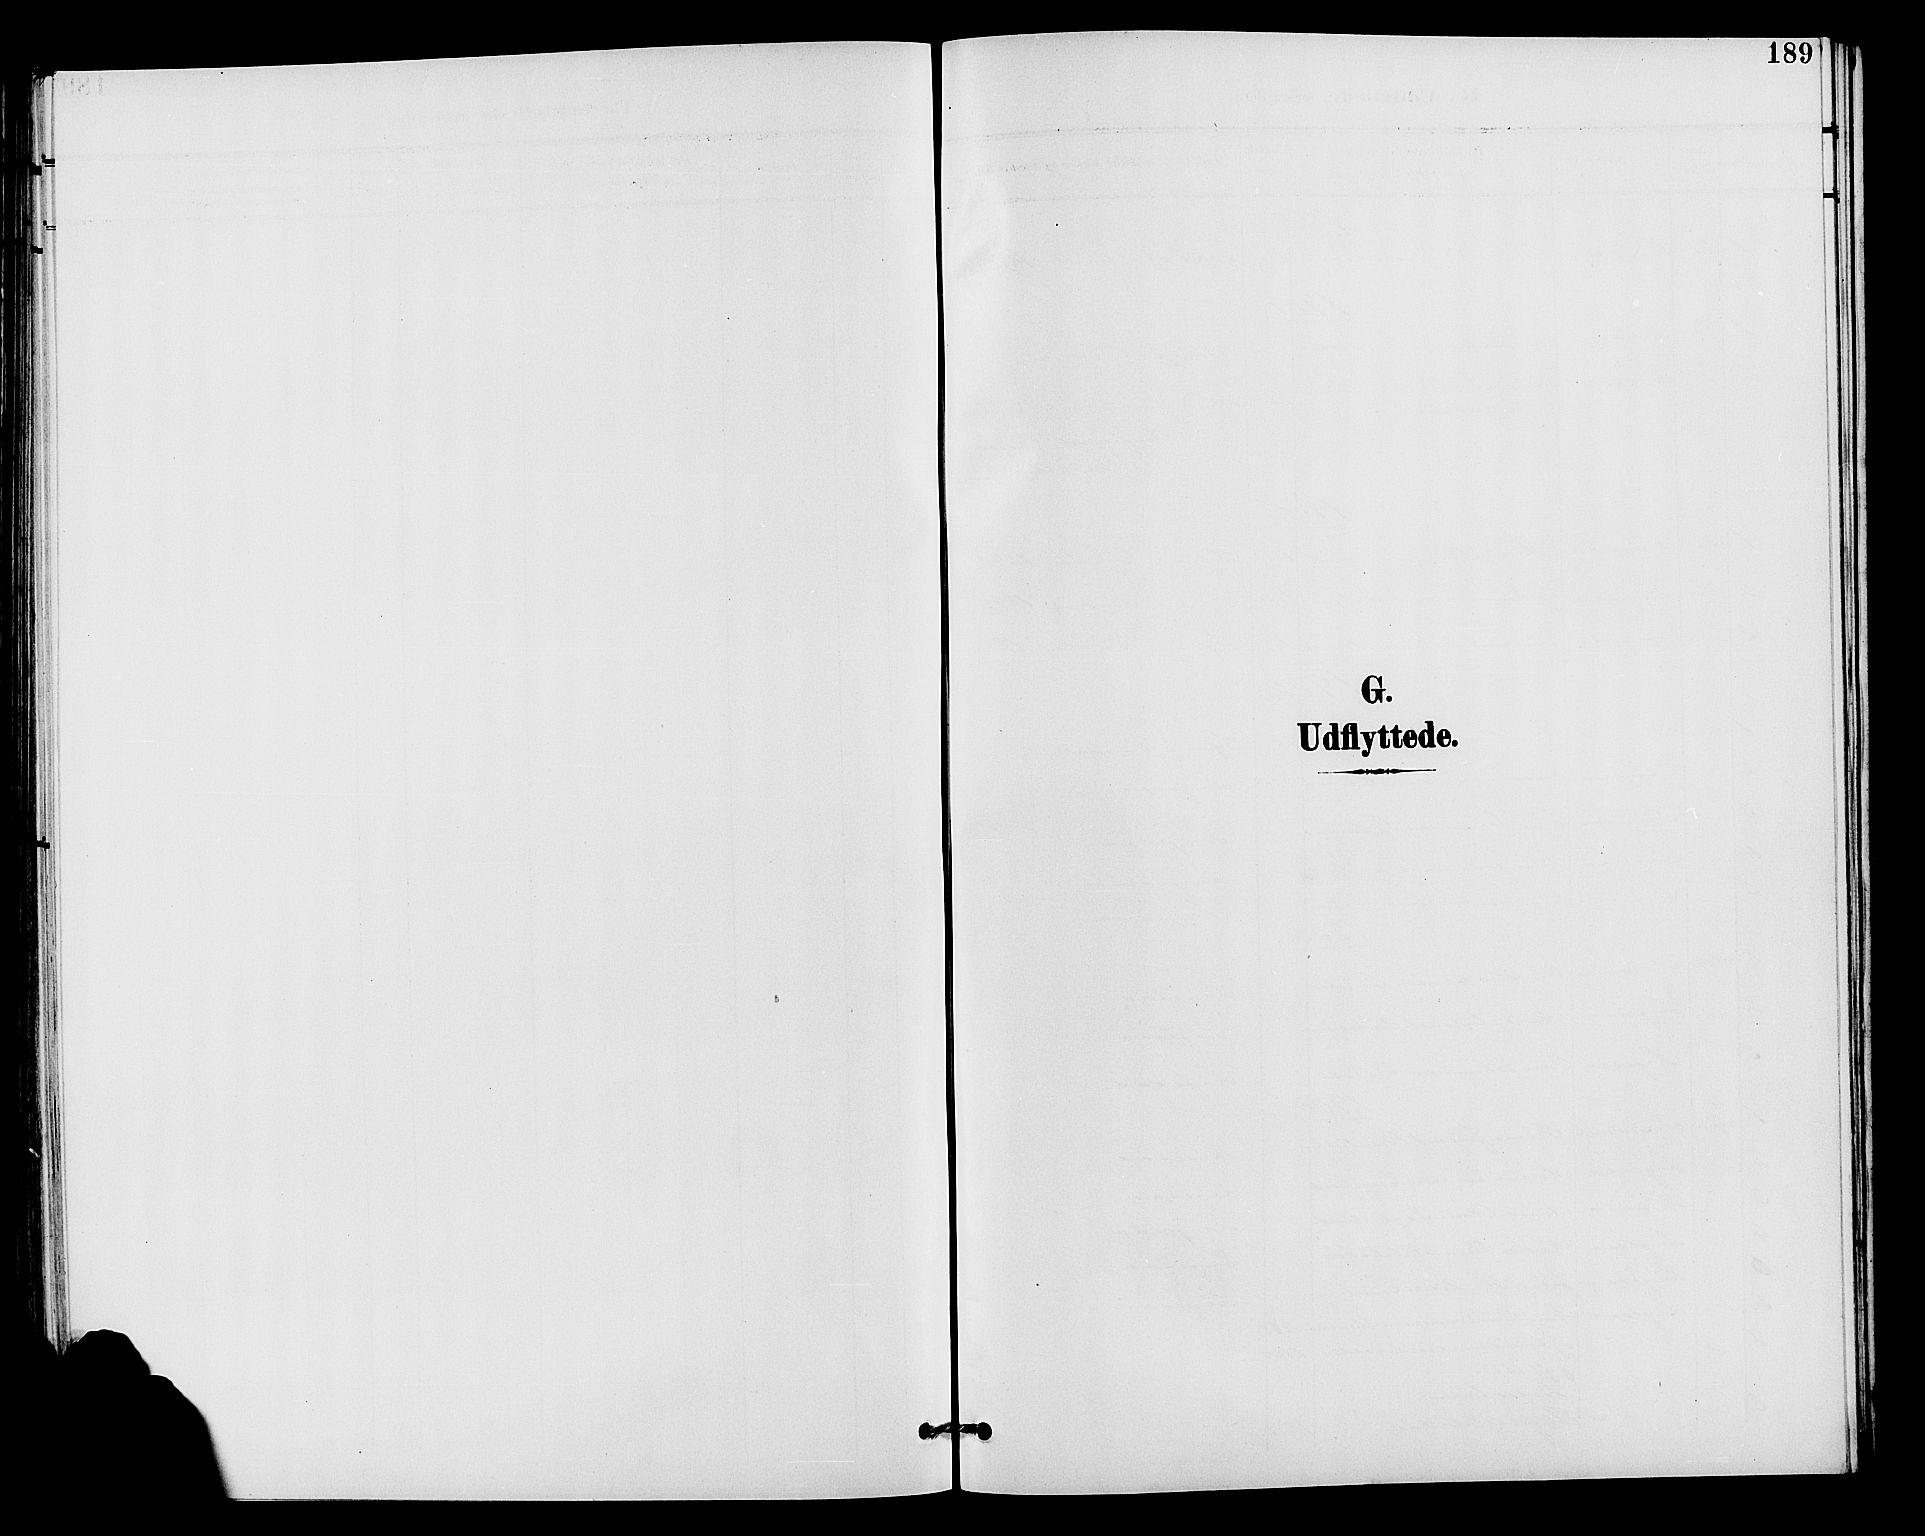 SAH, Vardal prestekontor, H/Ha/Hab/L0011: Klokkerbok nr. 11, 1899-1913, s. 189